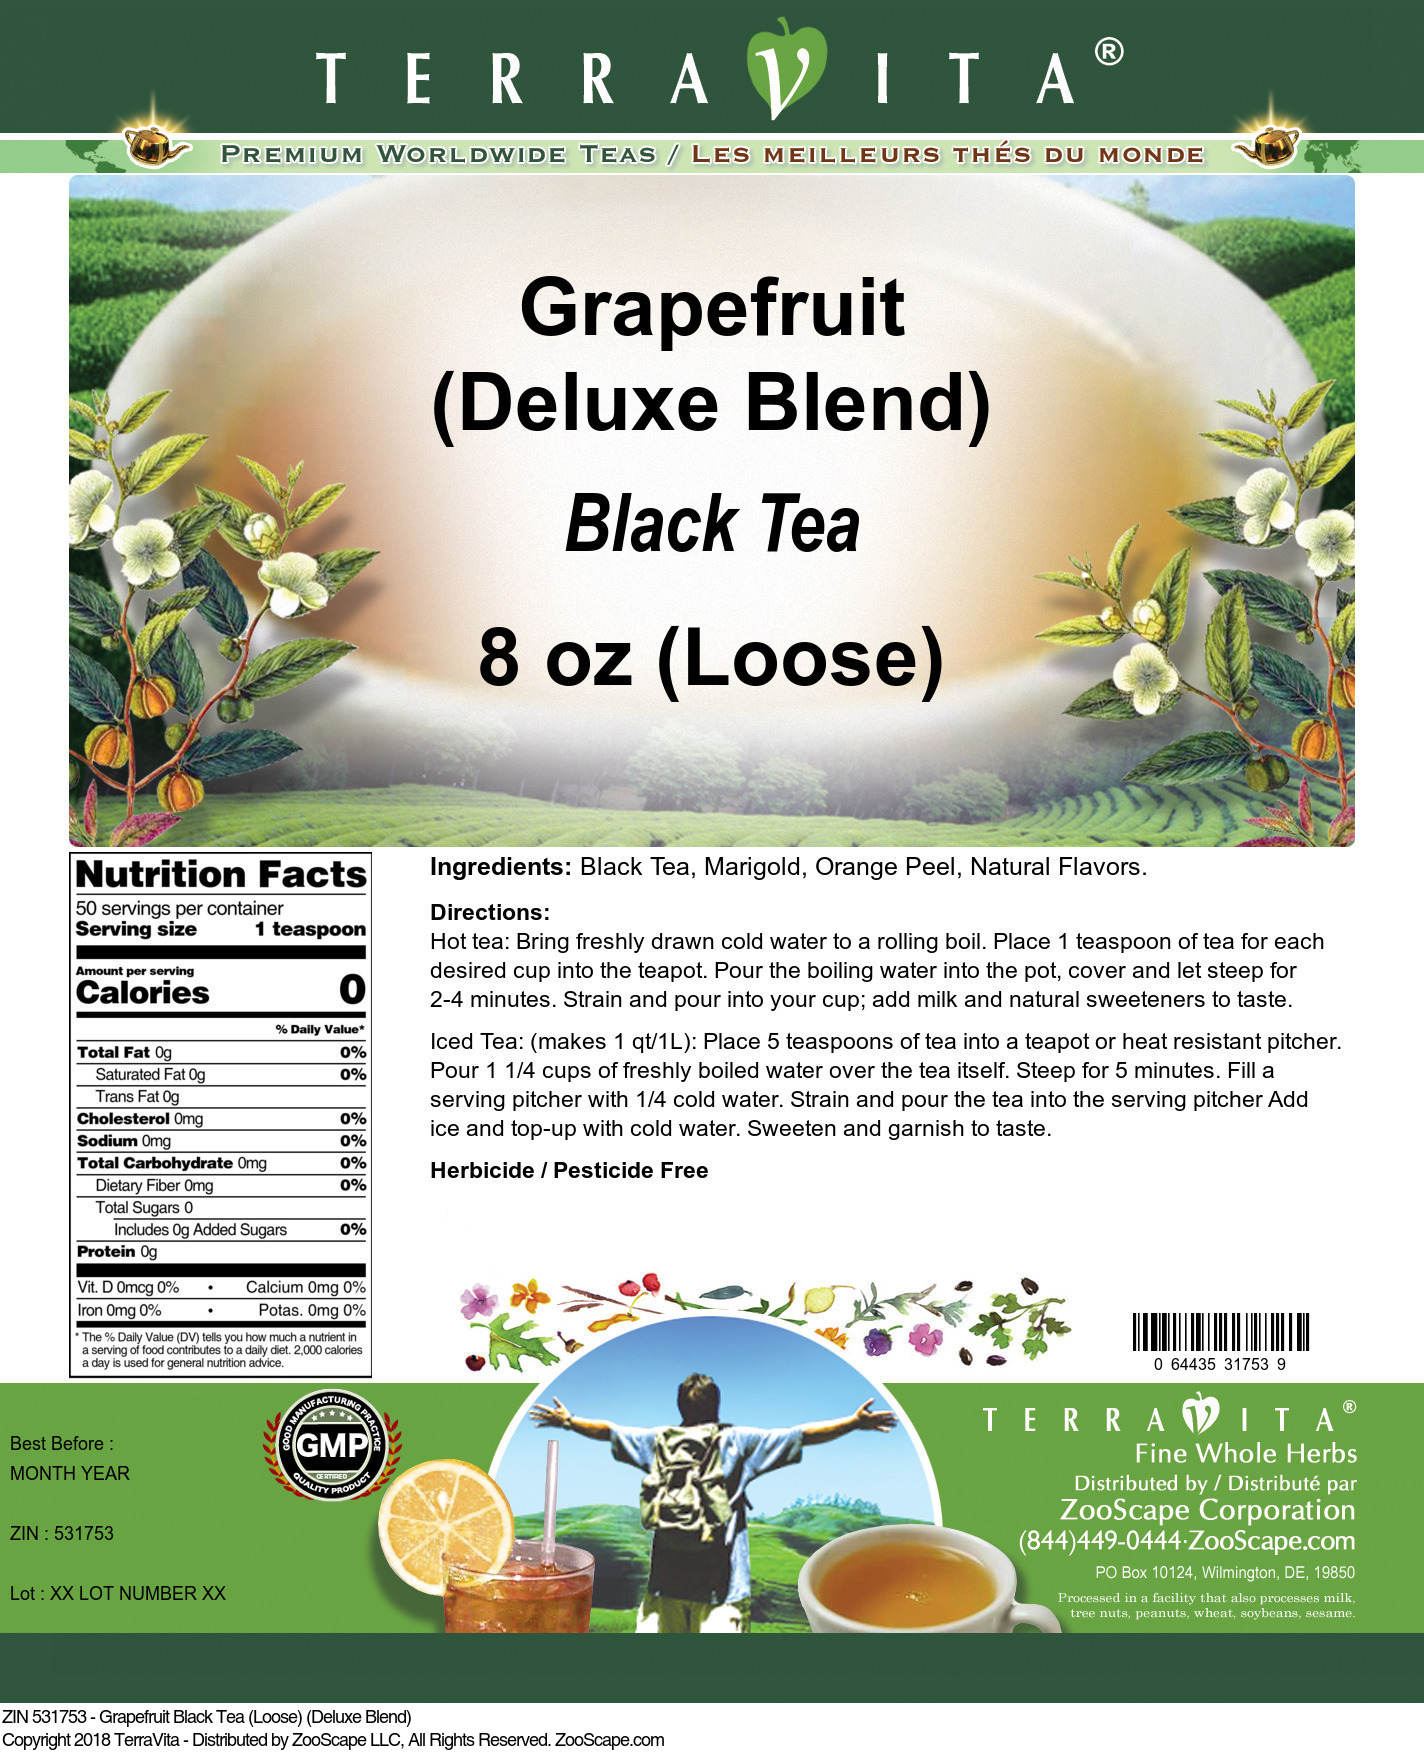 Grapefruit Black Tea